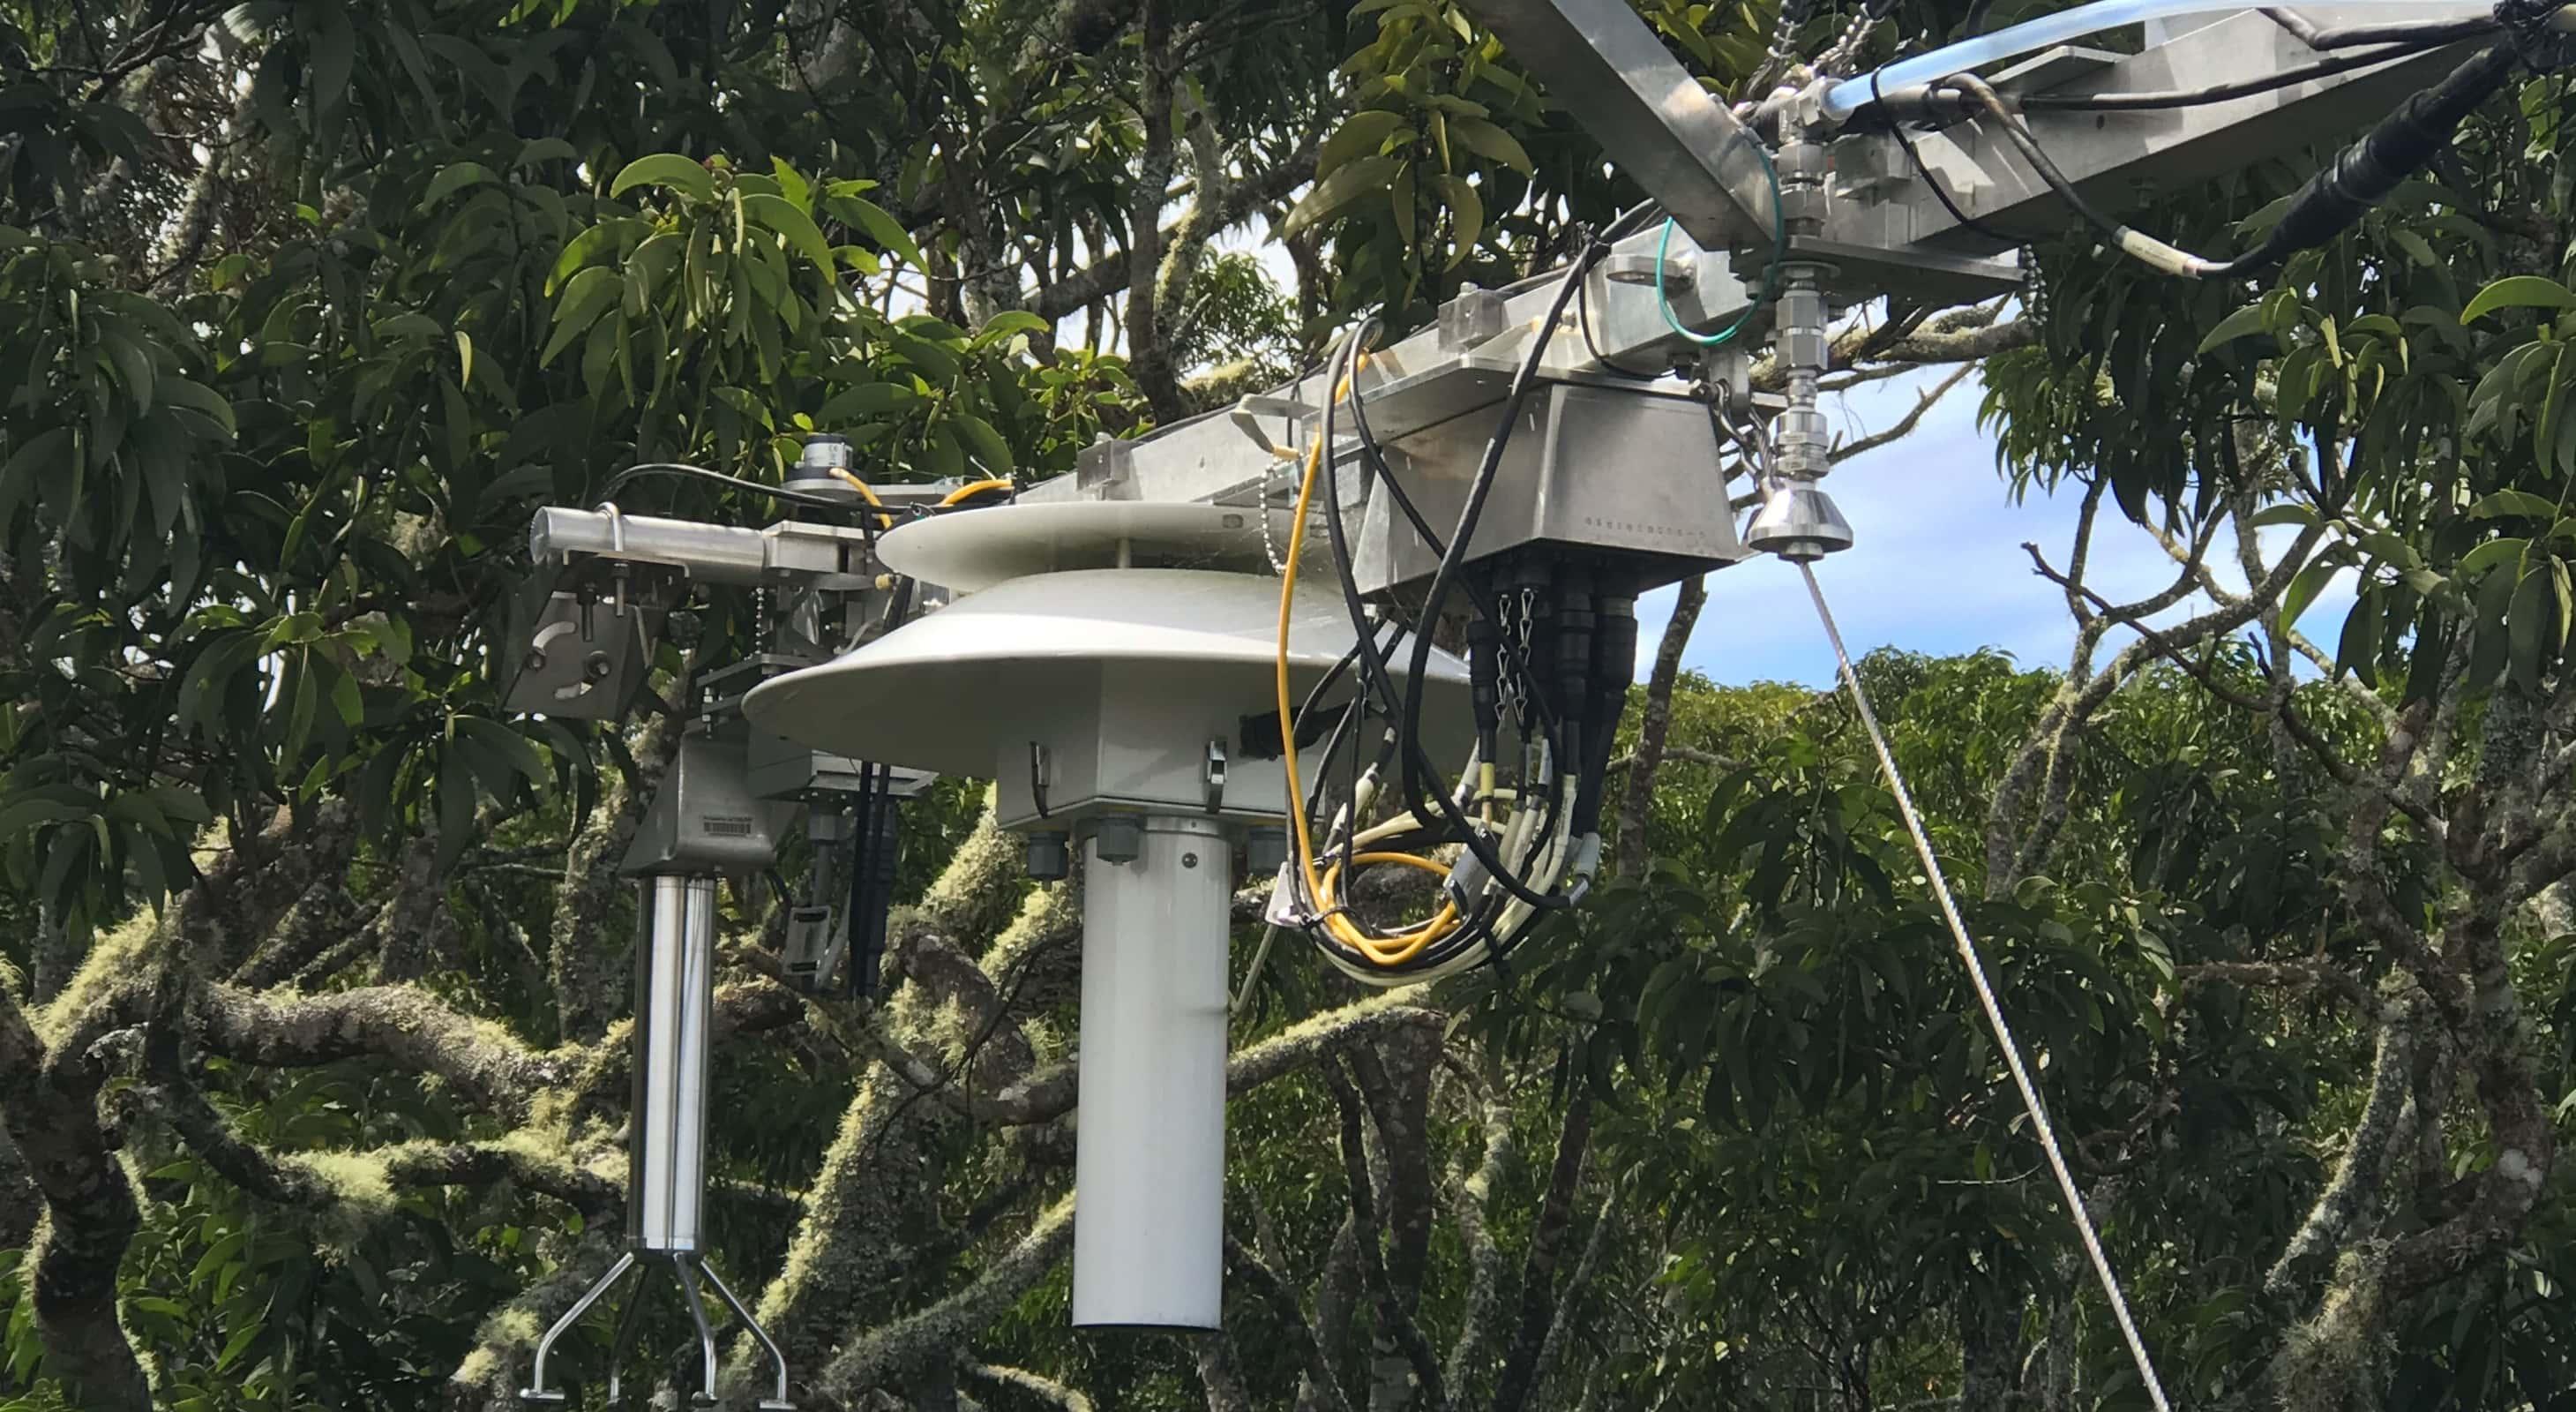 Observation tower at puʻumakaʻala in the canopy of Koa